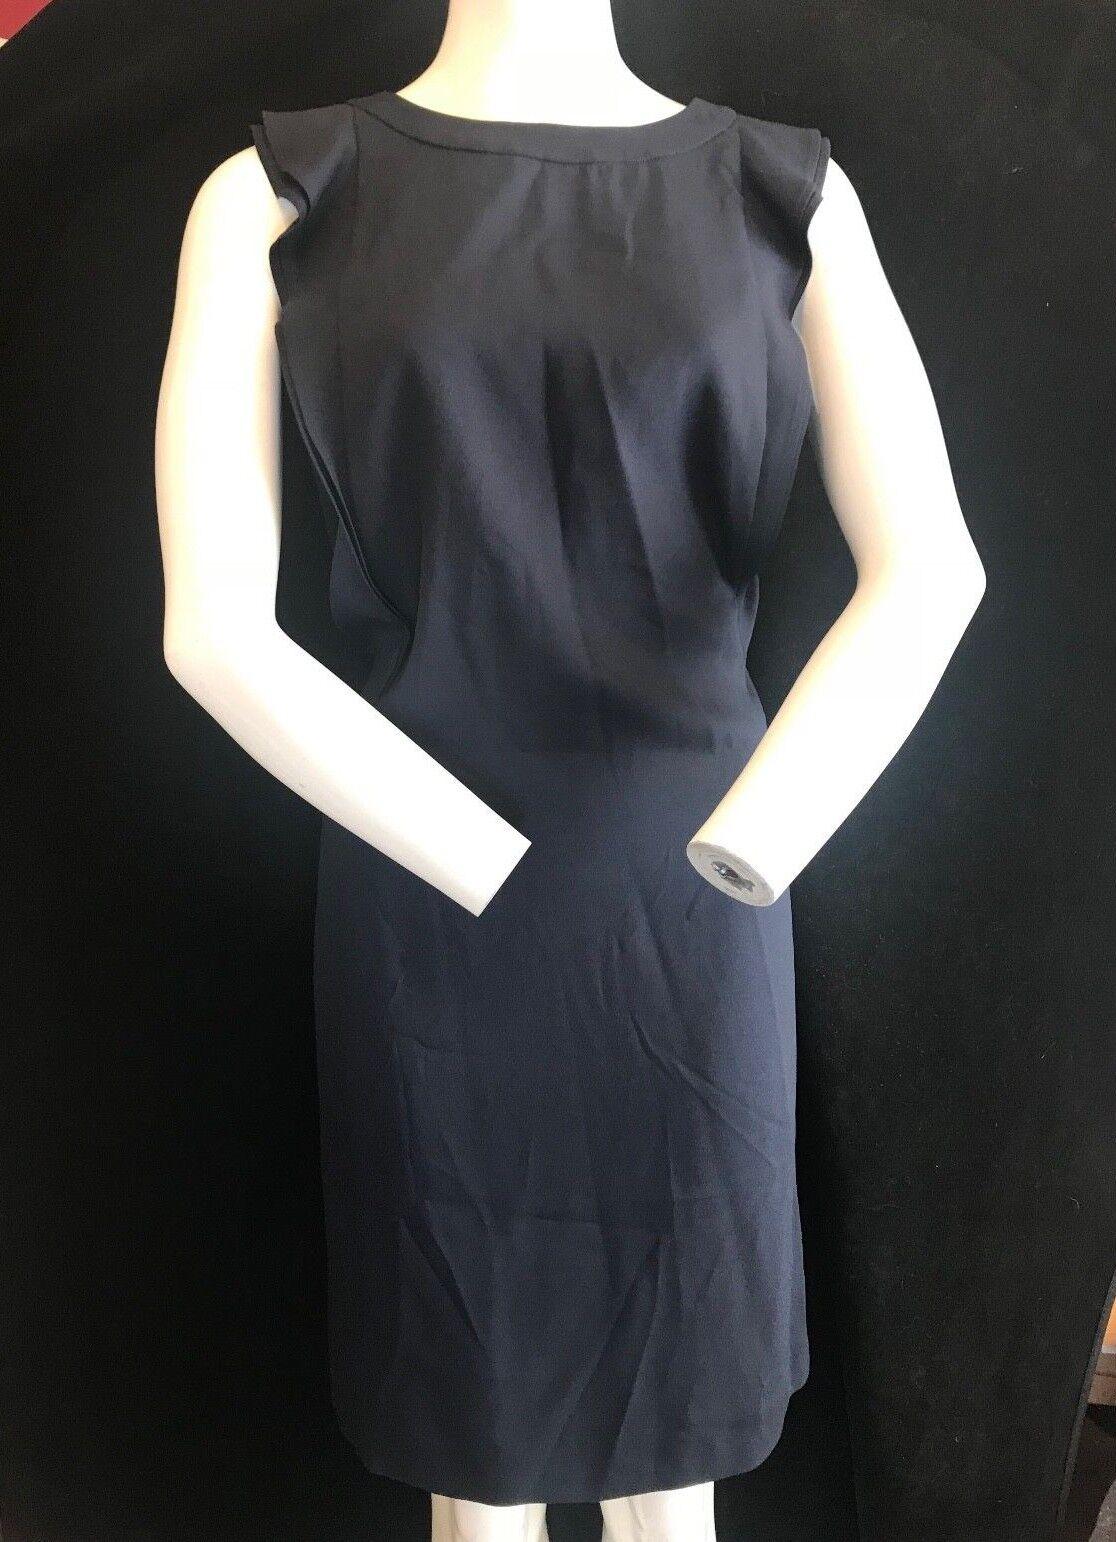 BNWT MARELLA Stylish Basco Crepe Ruffle Detail Shift Dress RRP